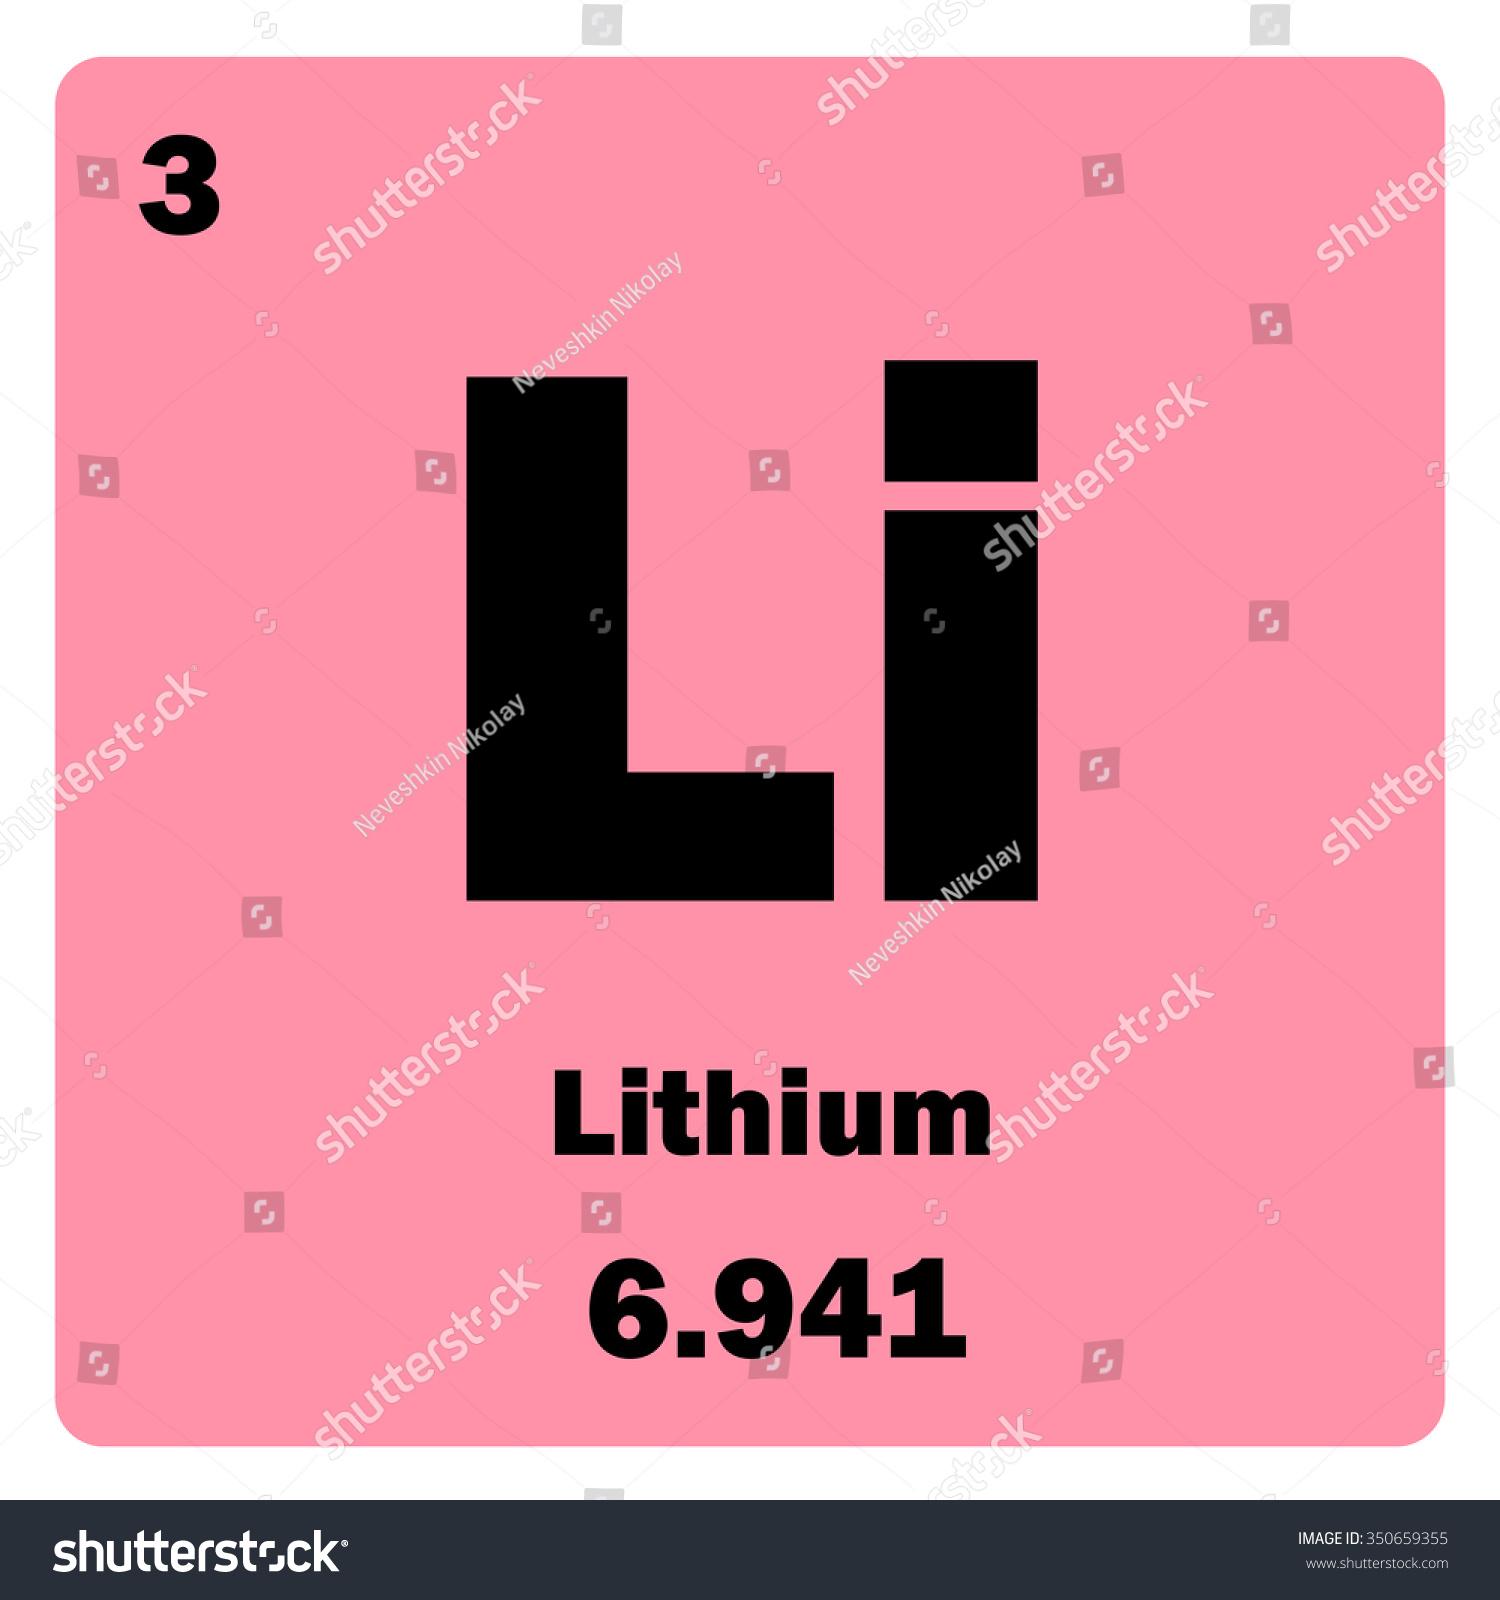 Vector illustration illustration shows chemical element stock illustration shows a chemical element lithium group of alkali metal gamestrikefo Choice Image